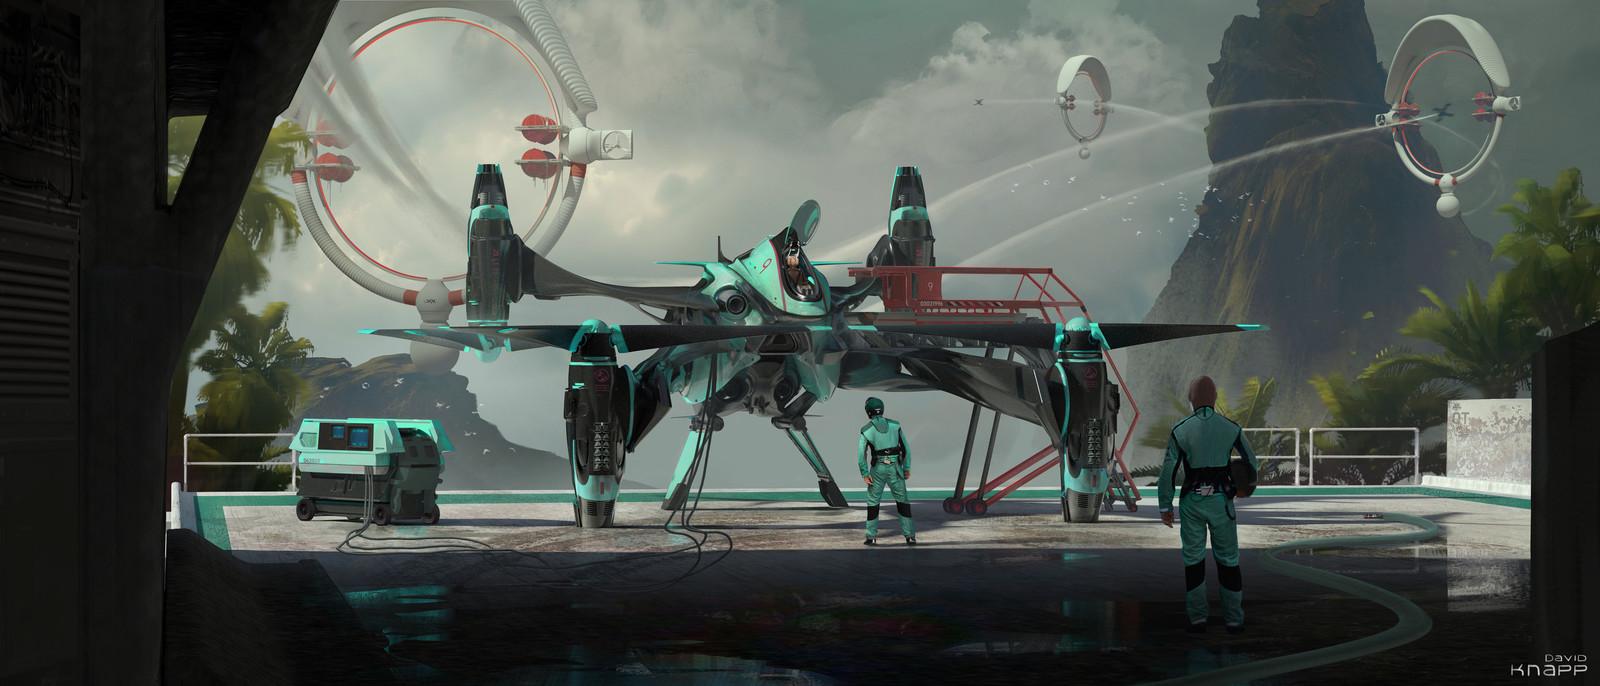 Racing Drone - 15M Class